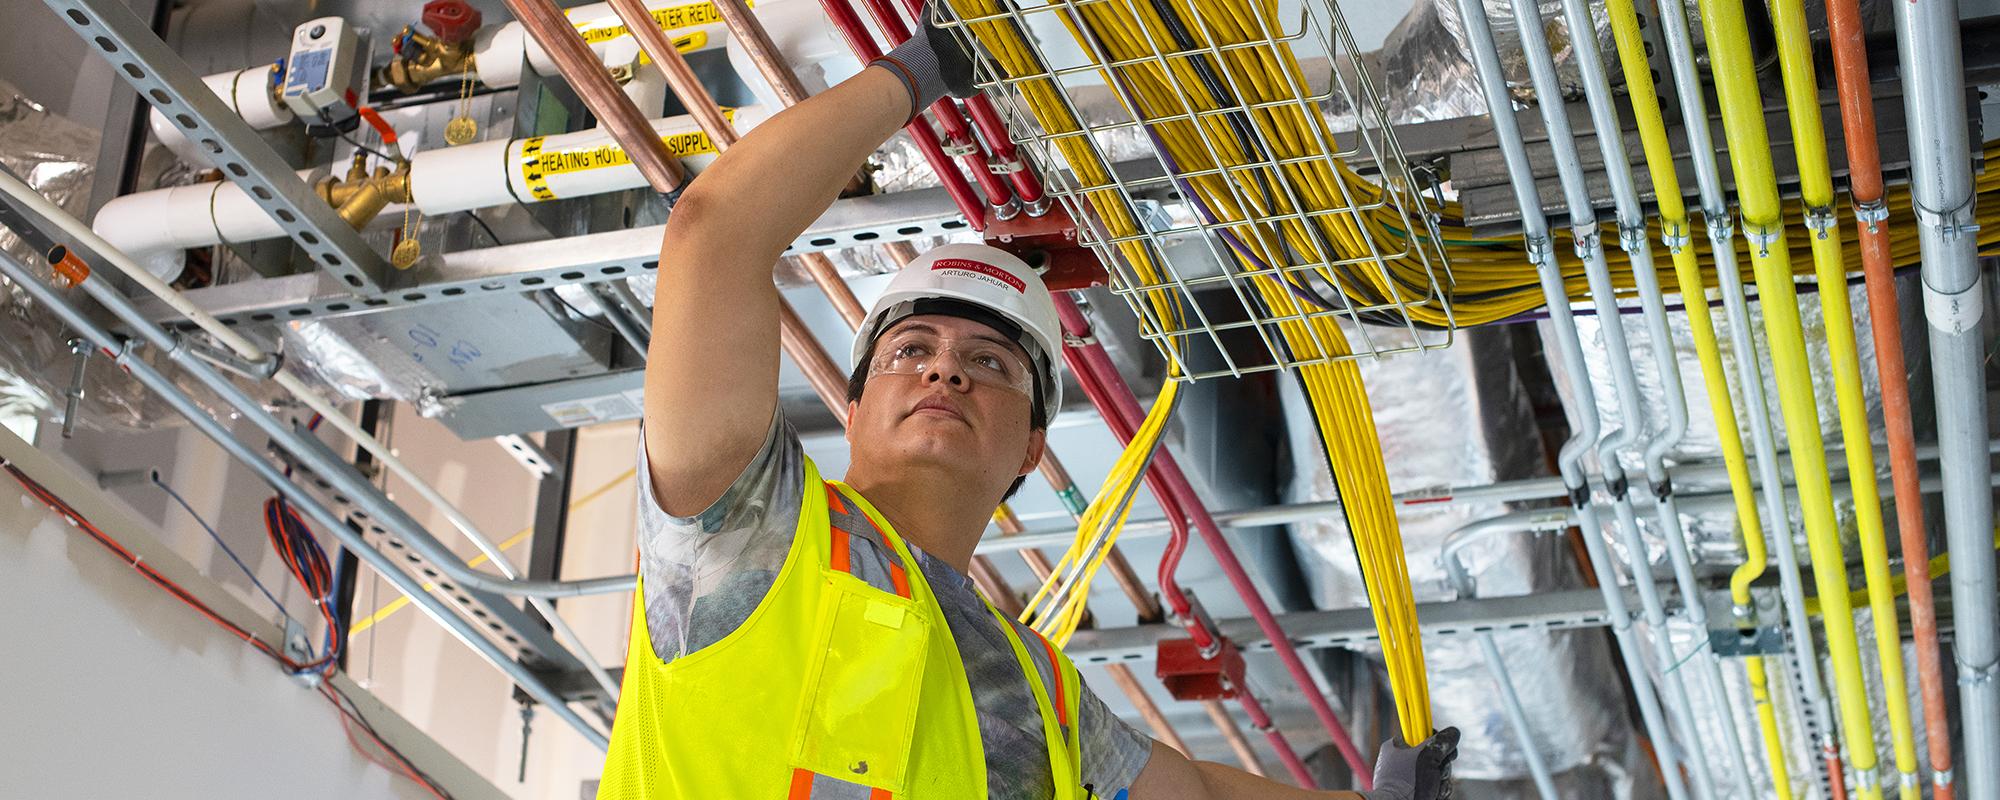 Man installing overhead conduit